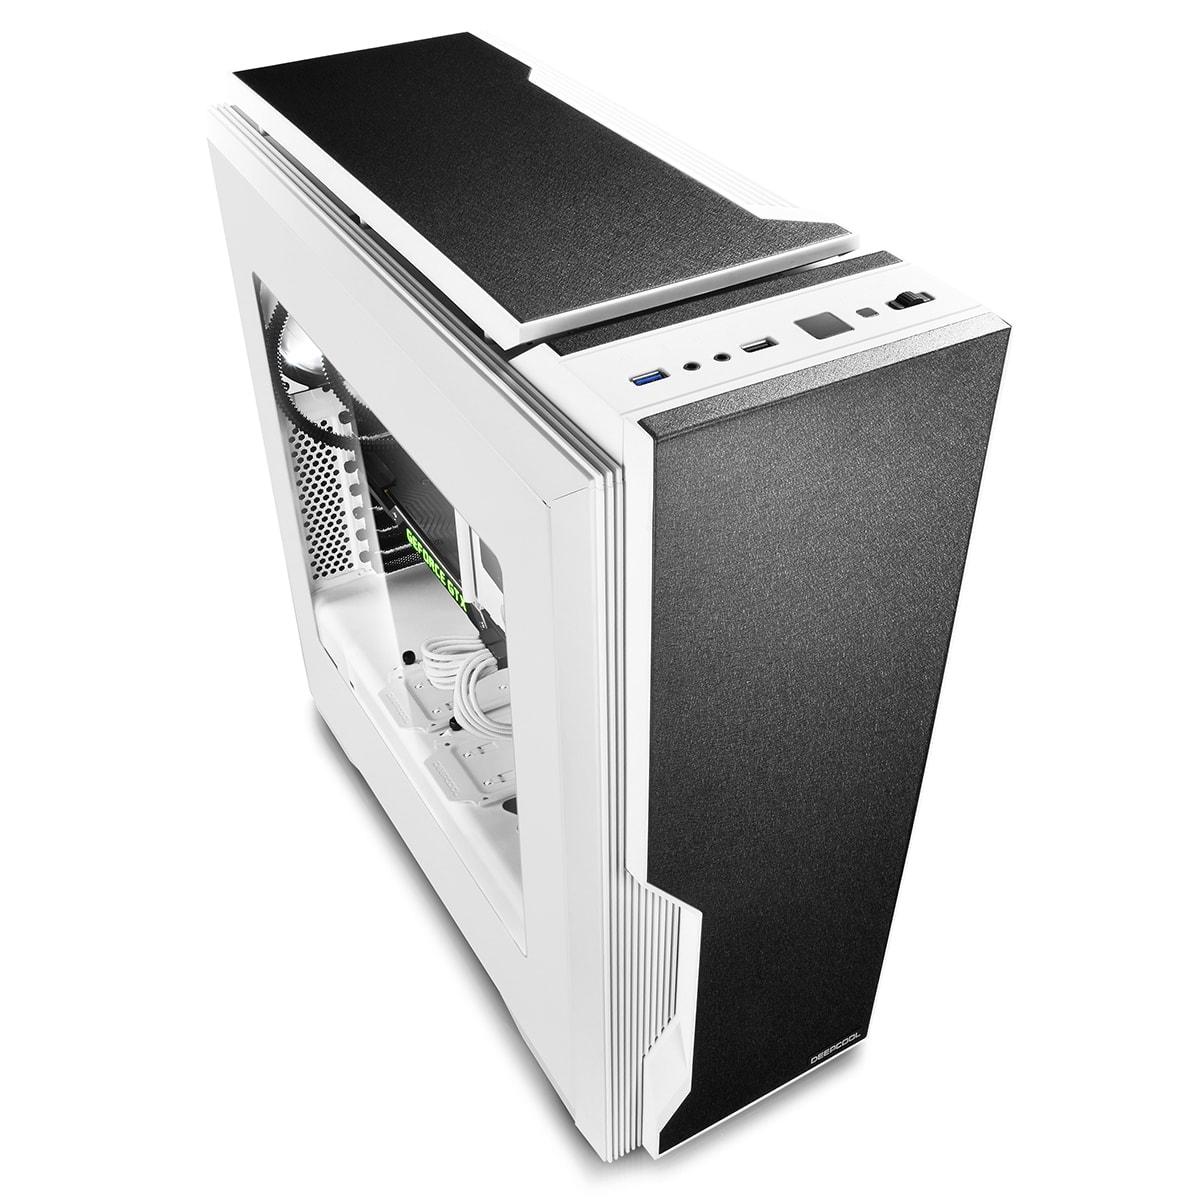 Deepcool mT/Ss Alim/ATX Blanc - Boîtier PC Deepcool - Cybertek.fr - 2